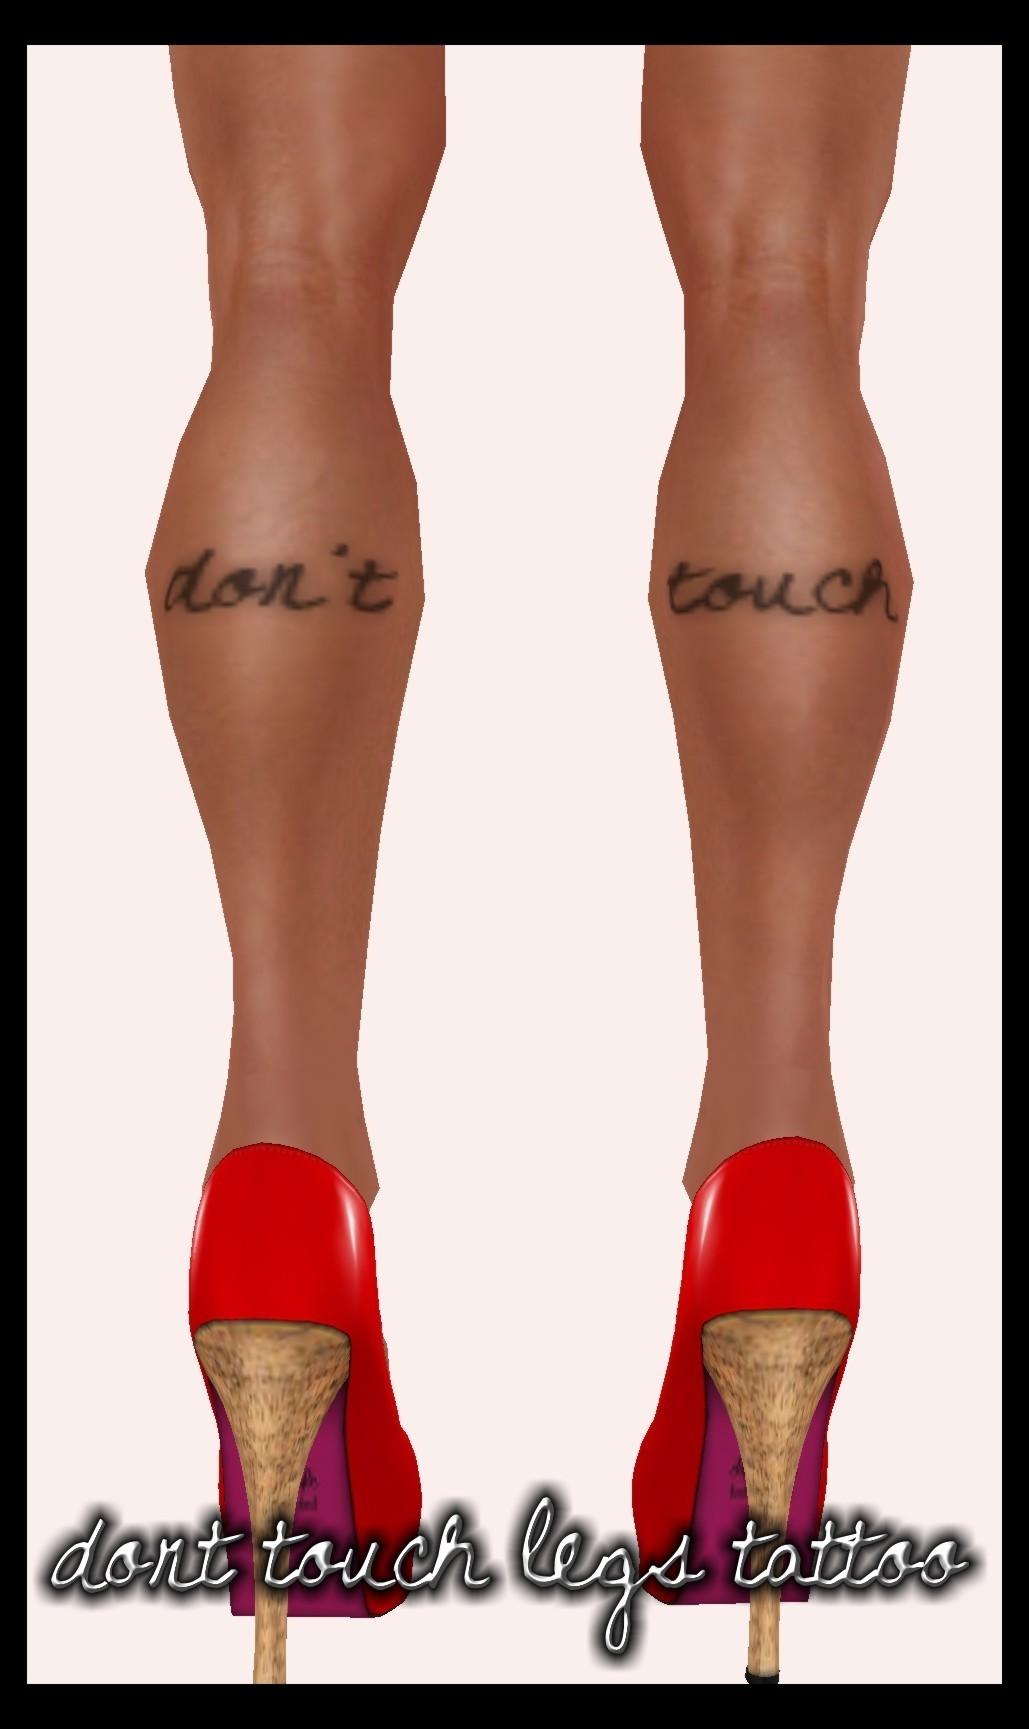 DK Dont touch Legs Tattoo